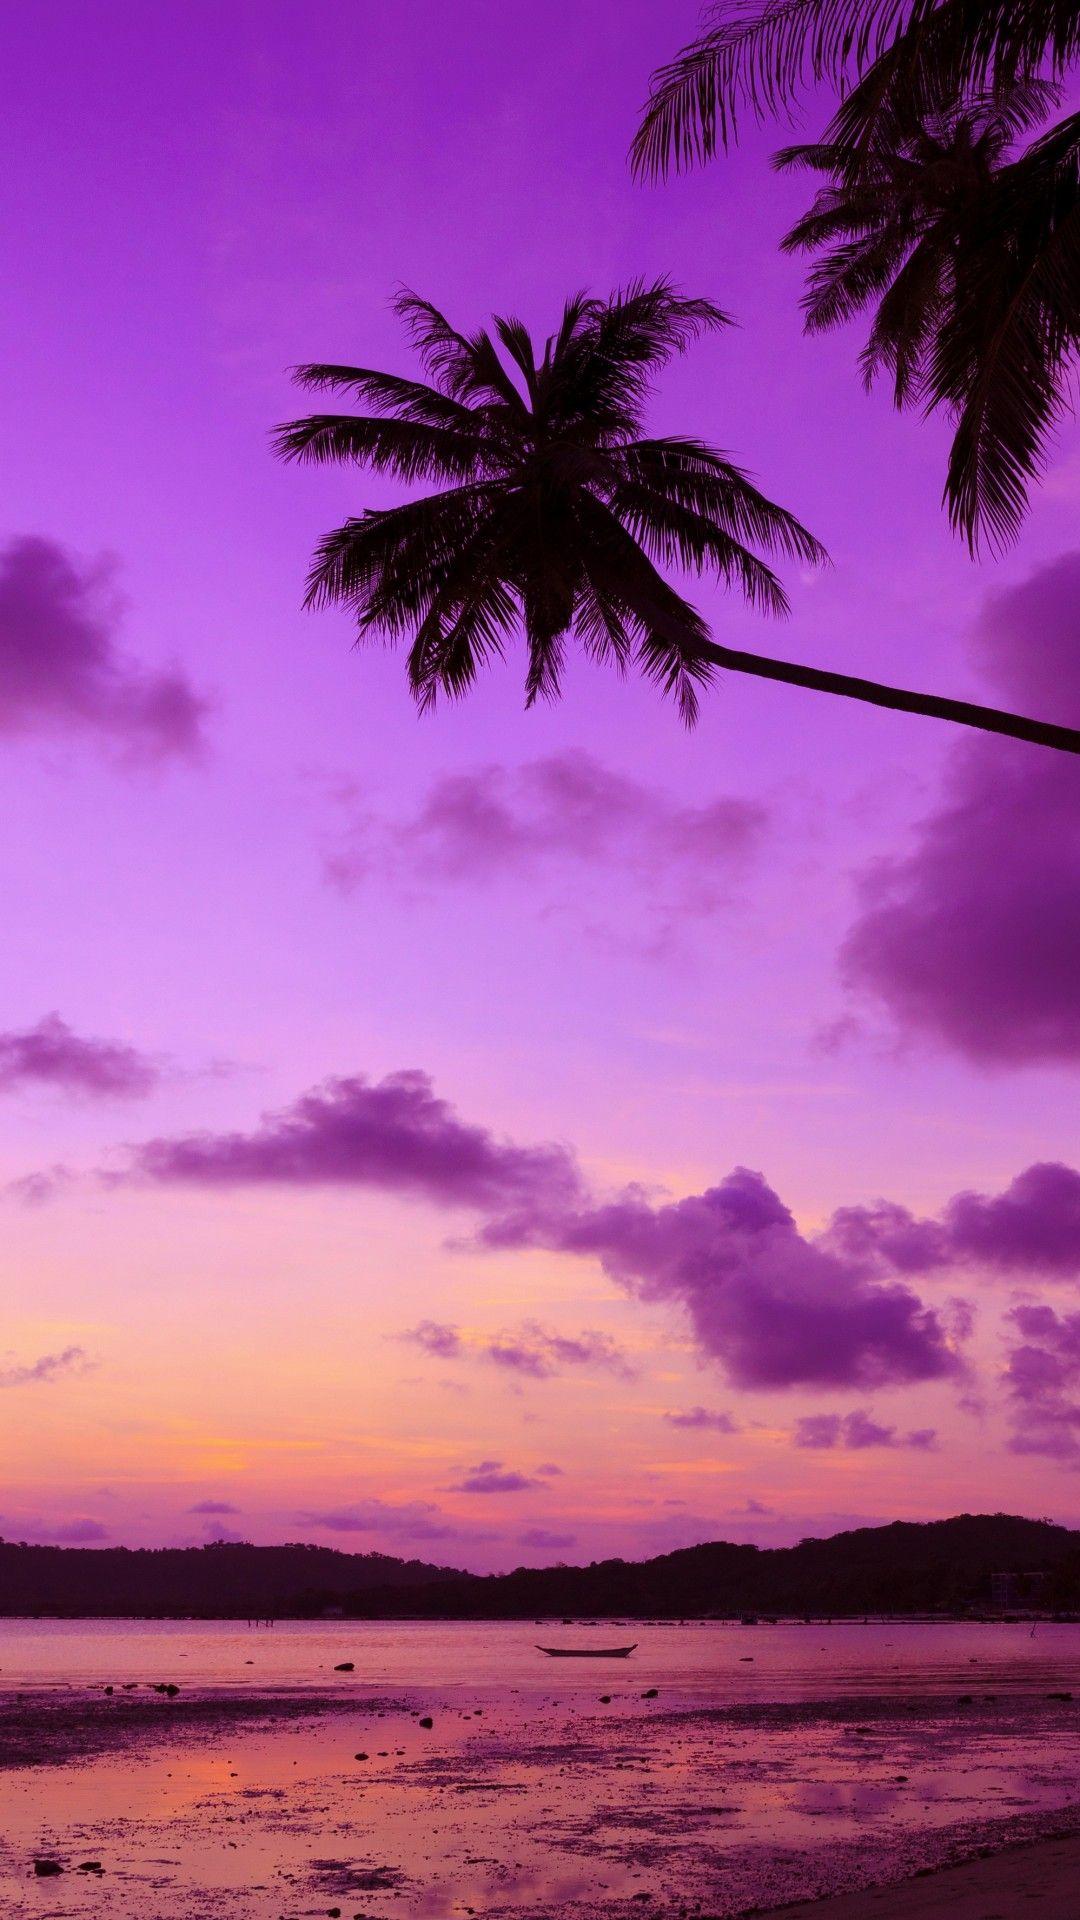 Download Beach Sunset Wallpaper High Resolution For Iphone Wallpaper Palm Trees Wallpaper Sunset Wallpaper Tree Wallpaper Iphone